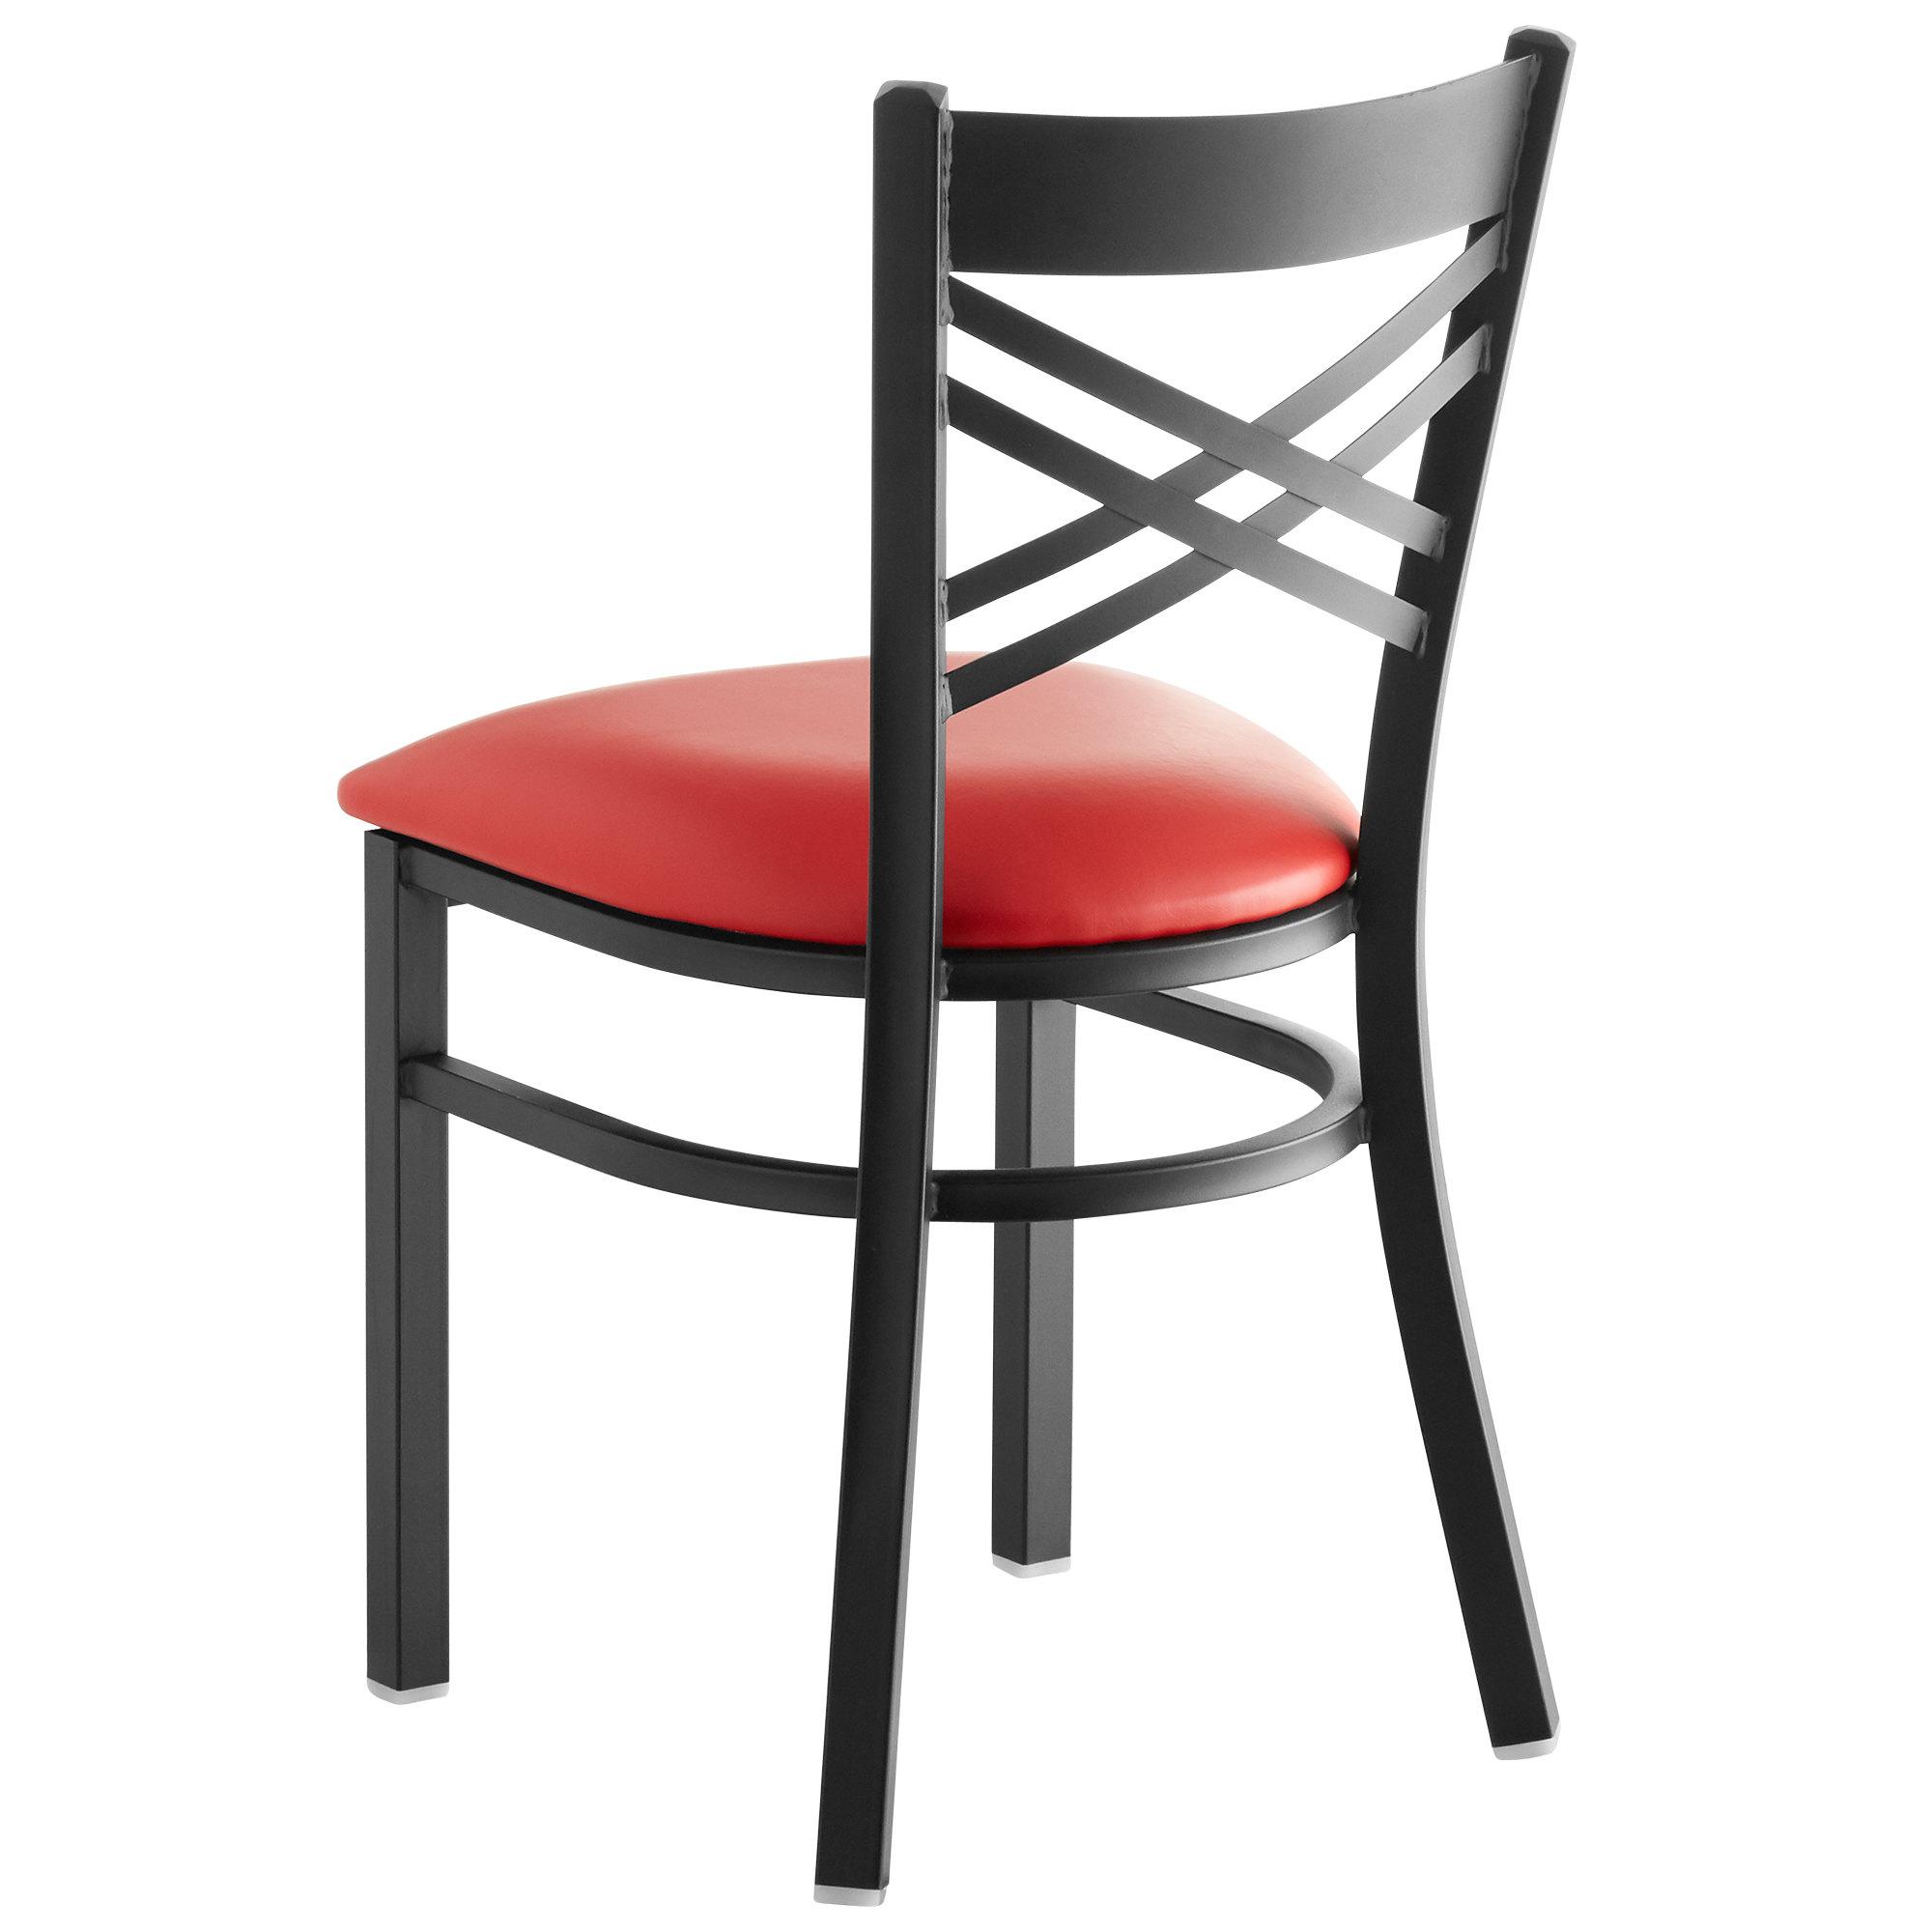 #152 - Black Cross Back Design Restaurant Metal Chair with Red Vinyl Seat